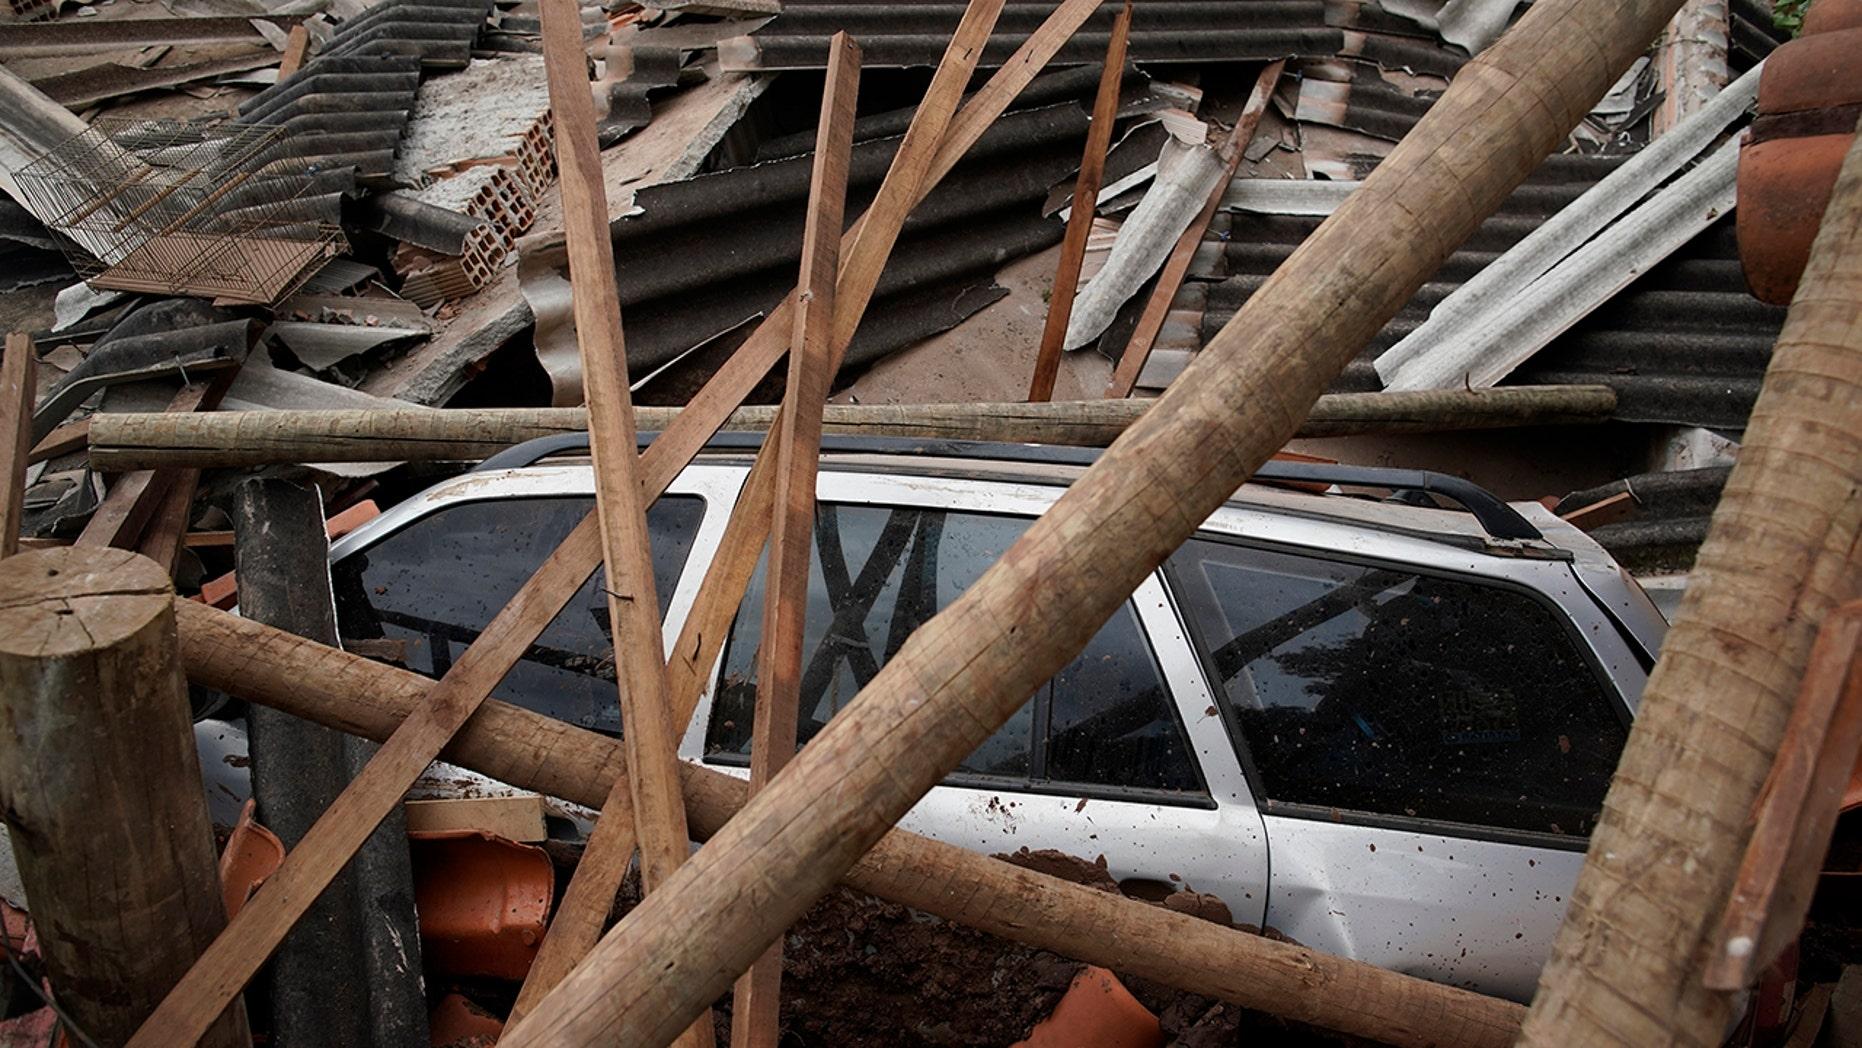 A car lies covered in debris after a dam collapse near Brumadinho, Brazil, Saturday, Jan. 26, 2019. (Associated Press)